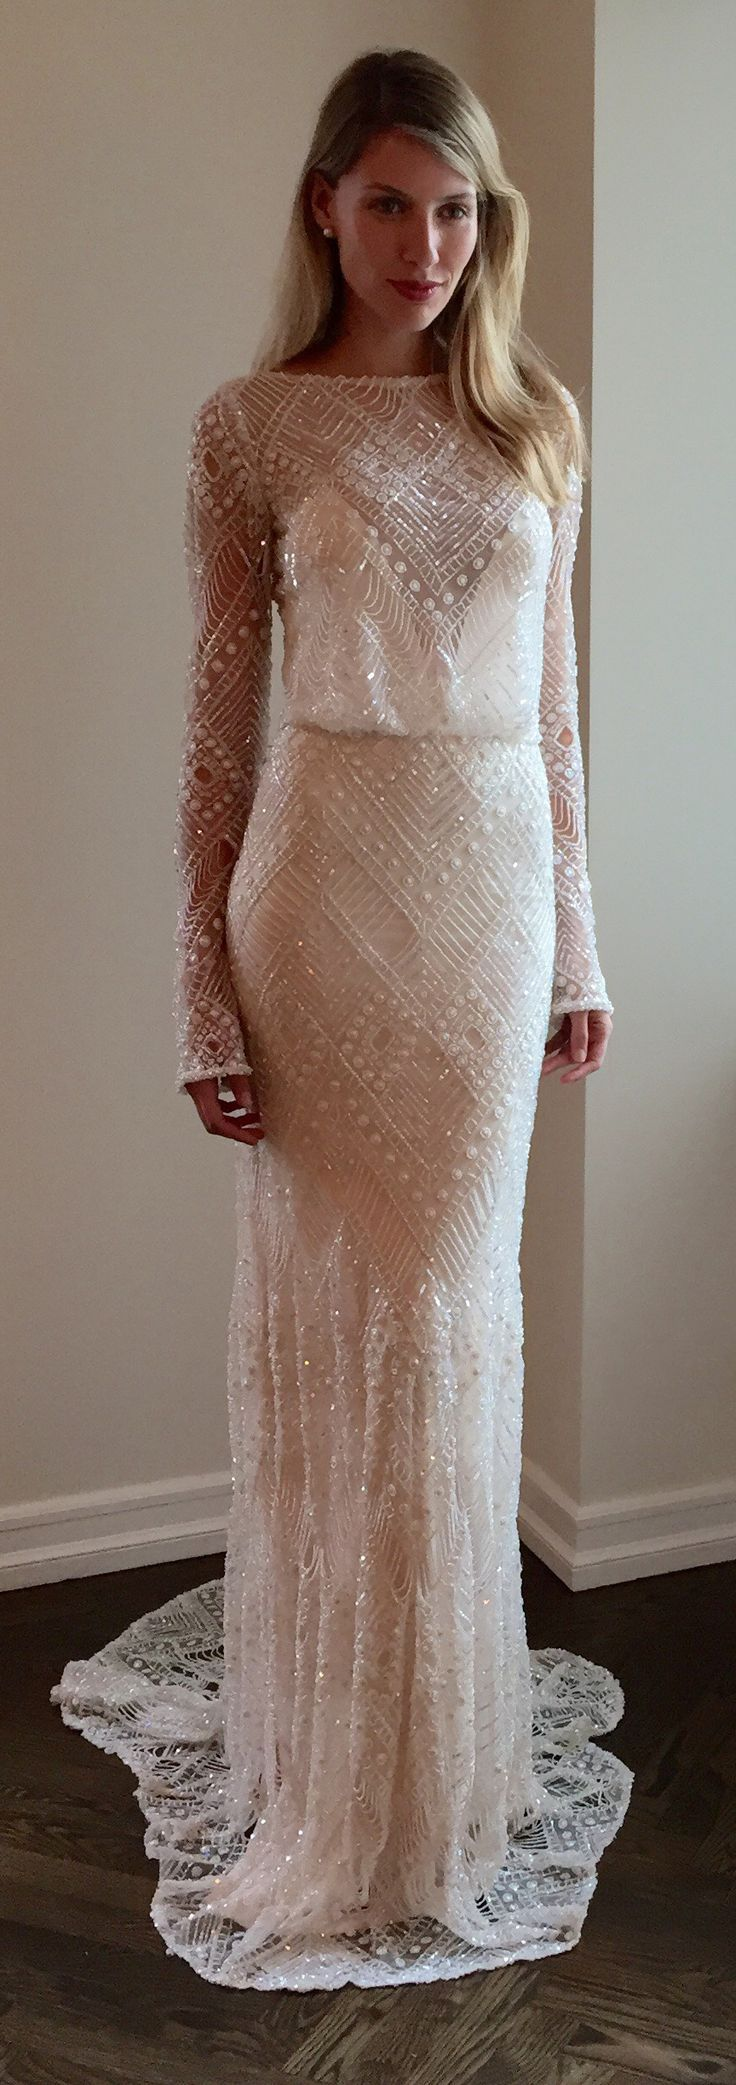 Beautiful long sleeve wedding dresses 47 | GirlYard.com | Bobs ...